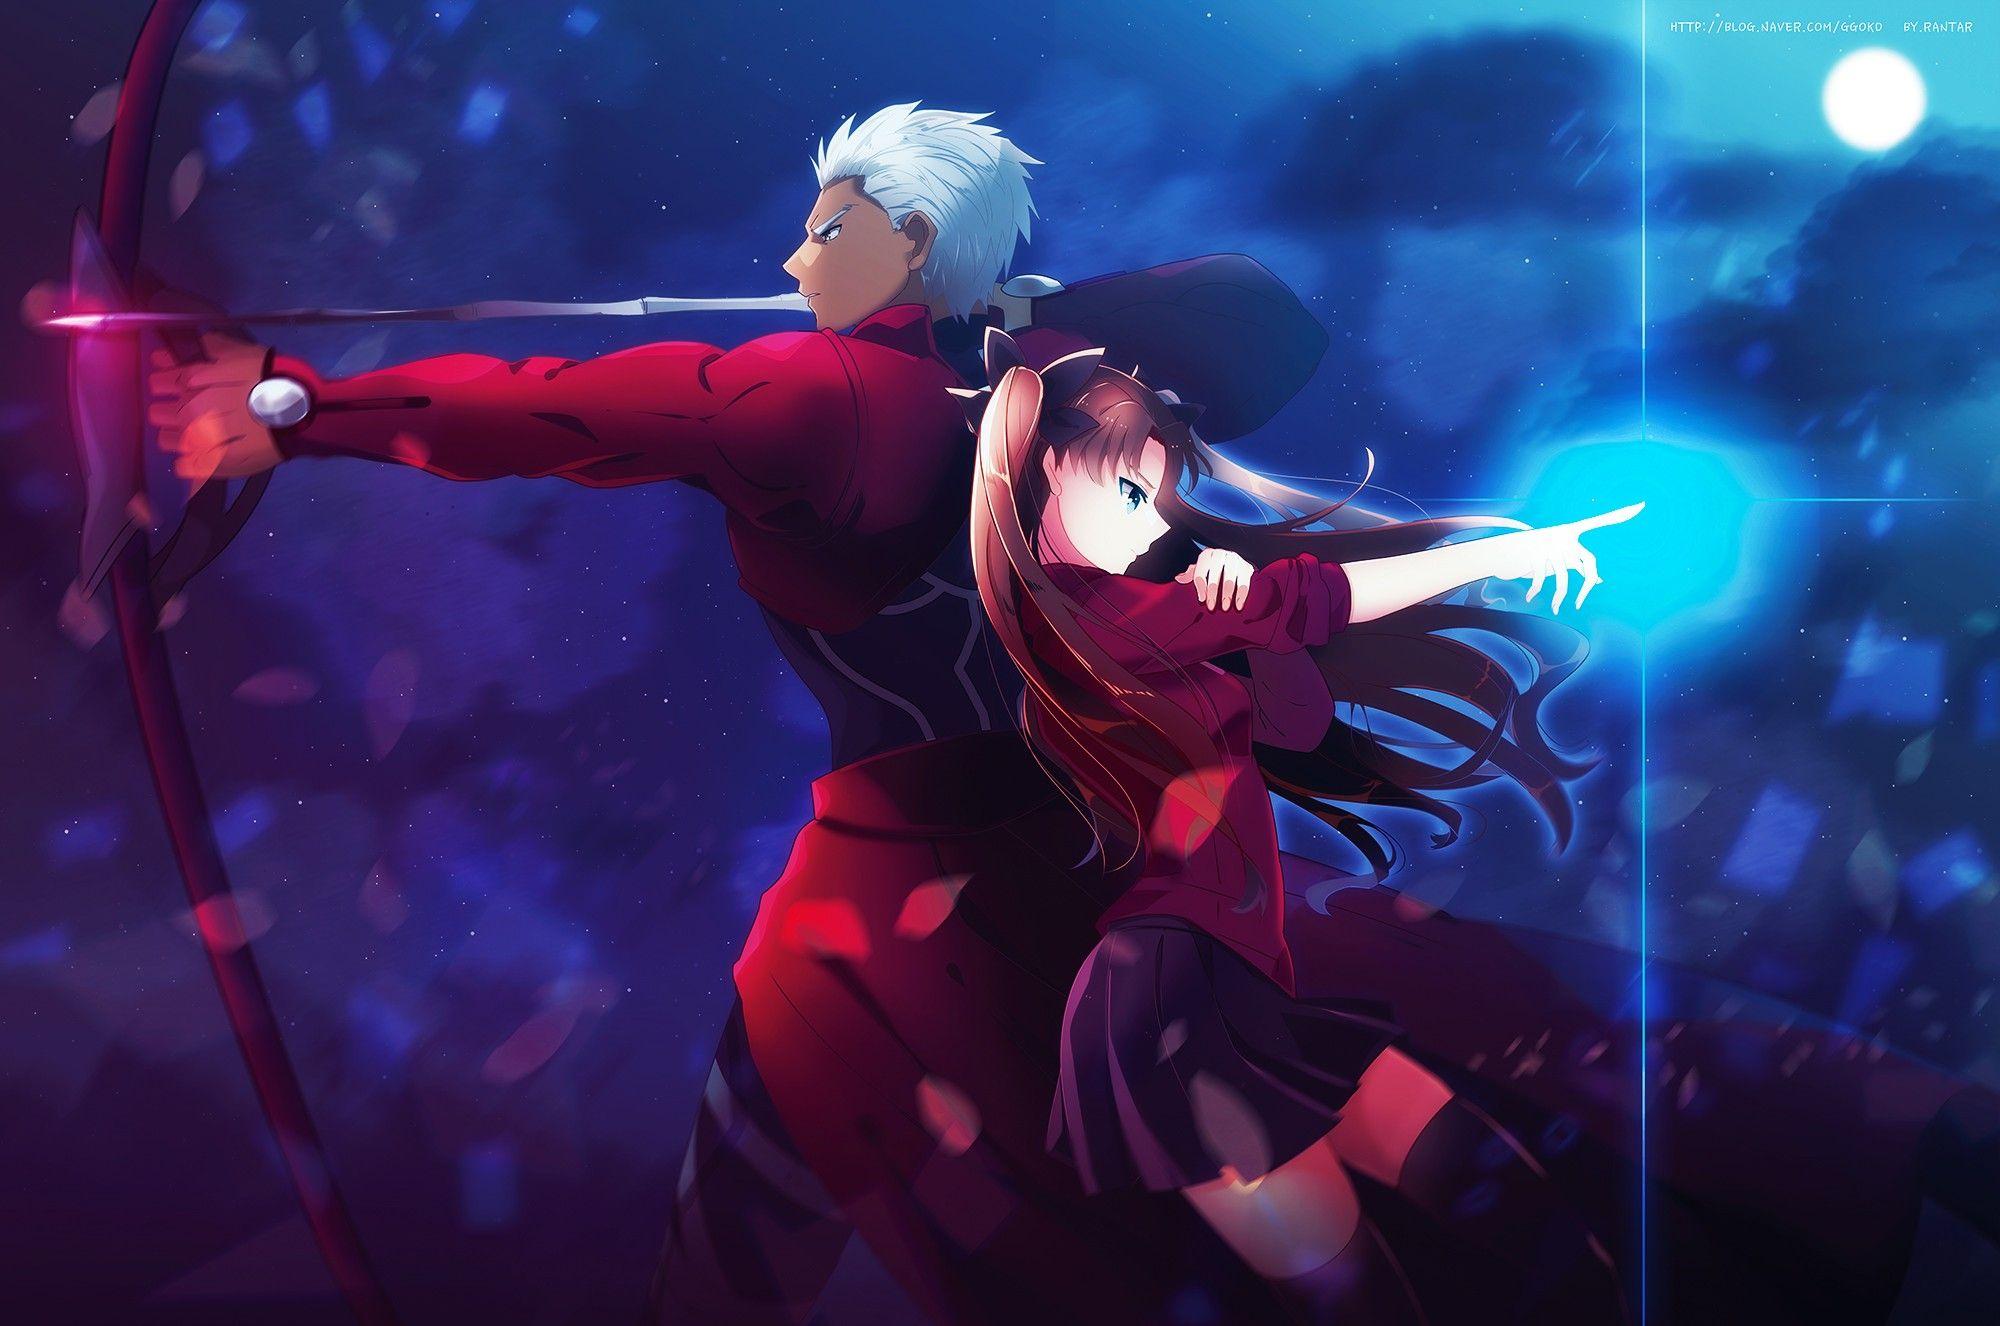 Anime 2000x1326 Anime Archer Fate Stay Night Fate Series Tohsaka Rin Anime Sedih Sedih